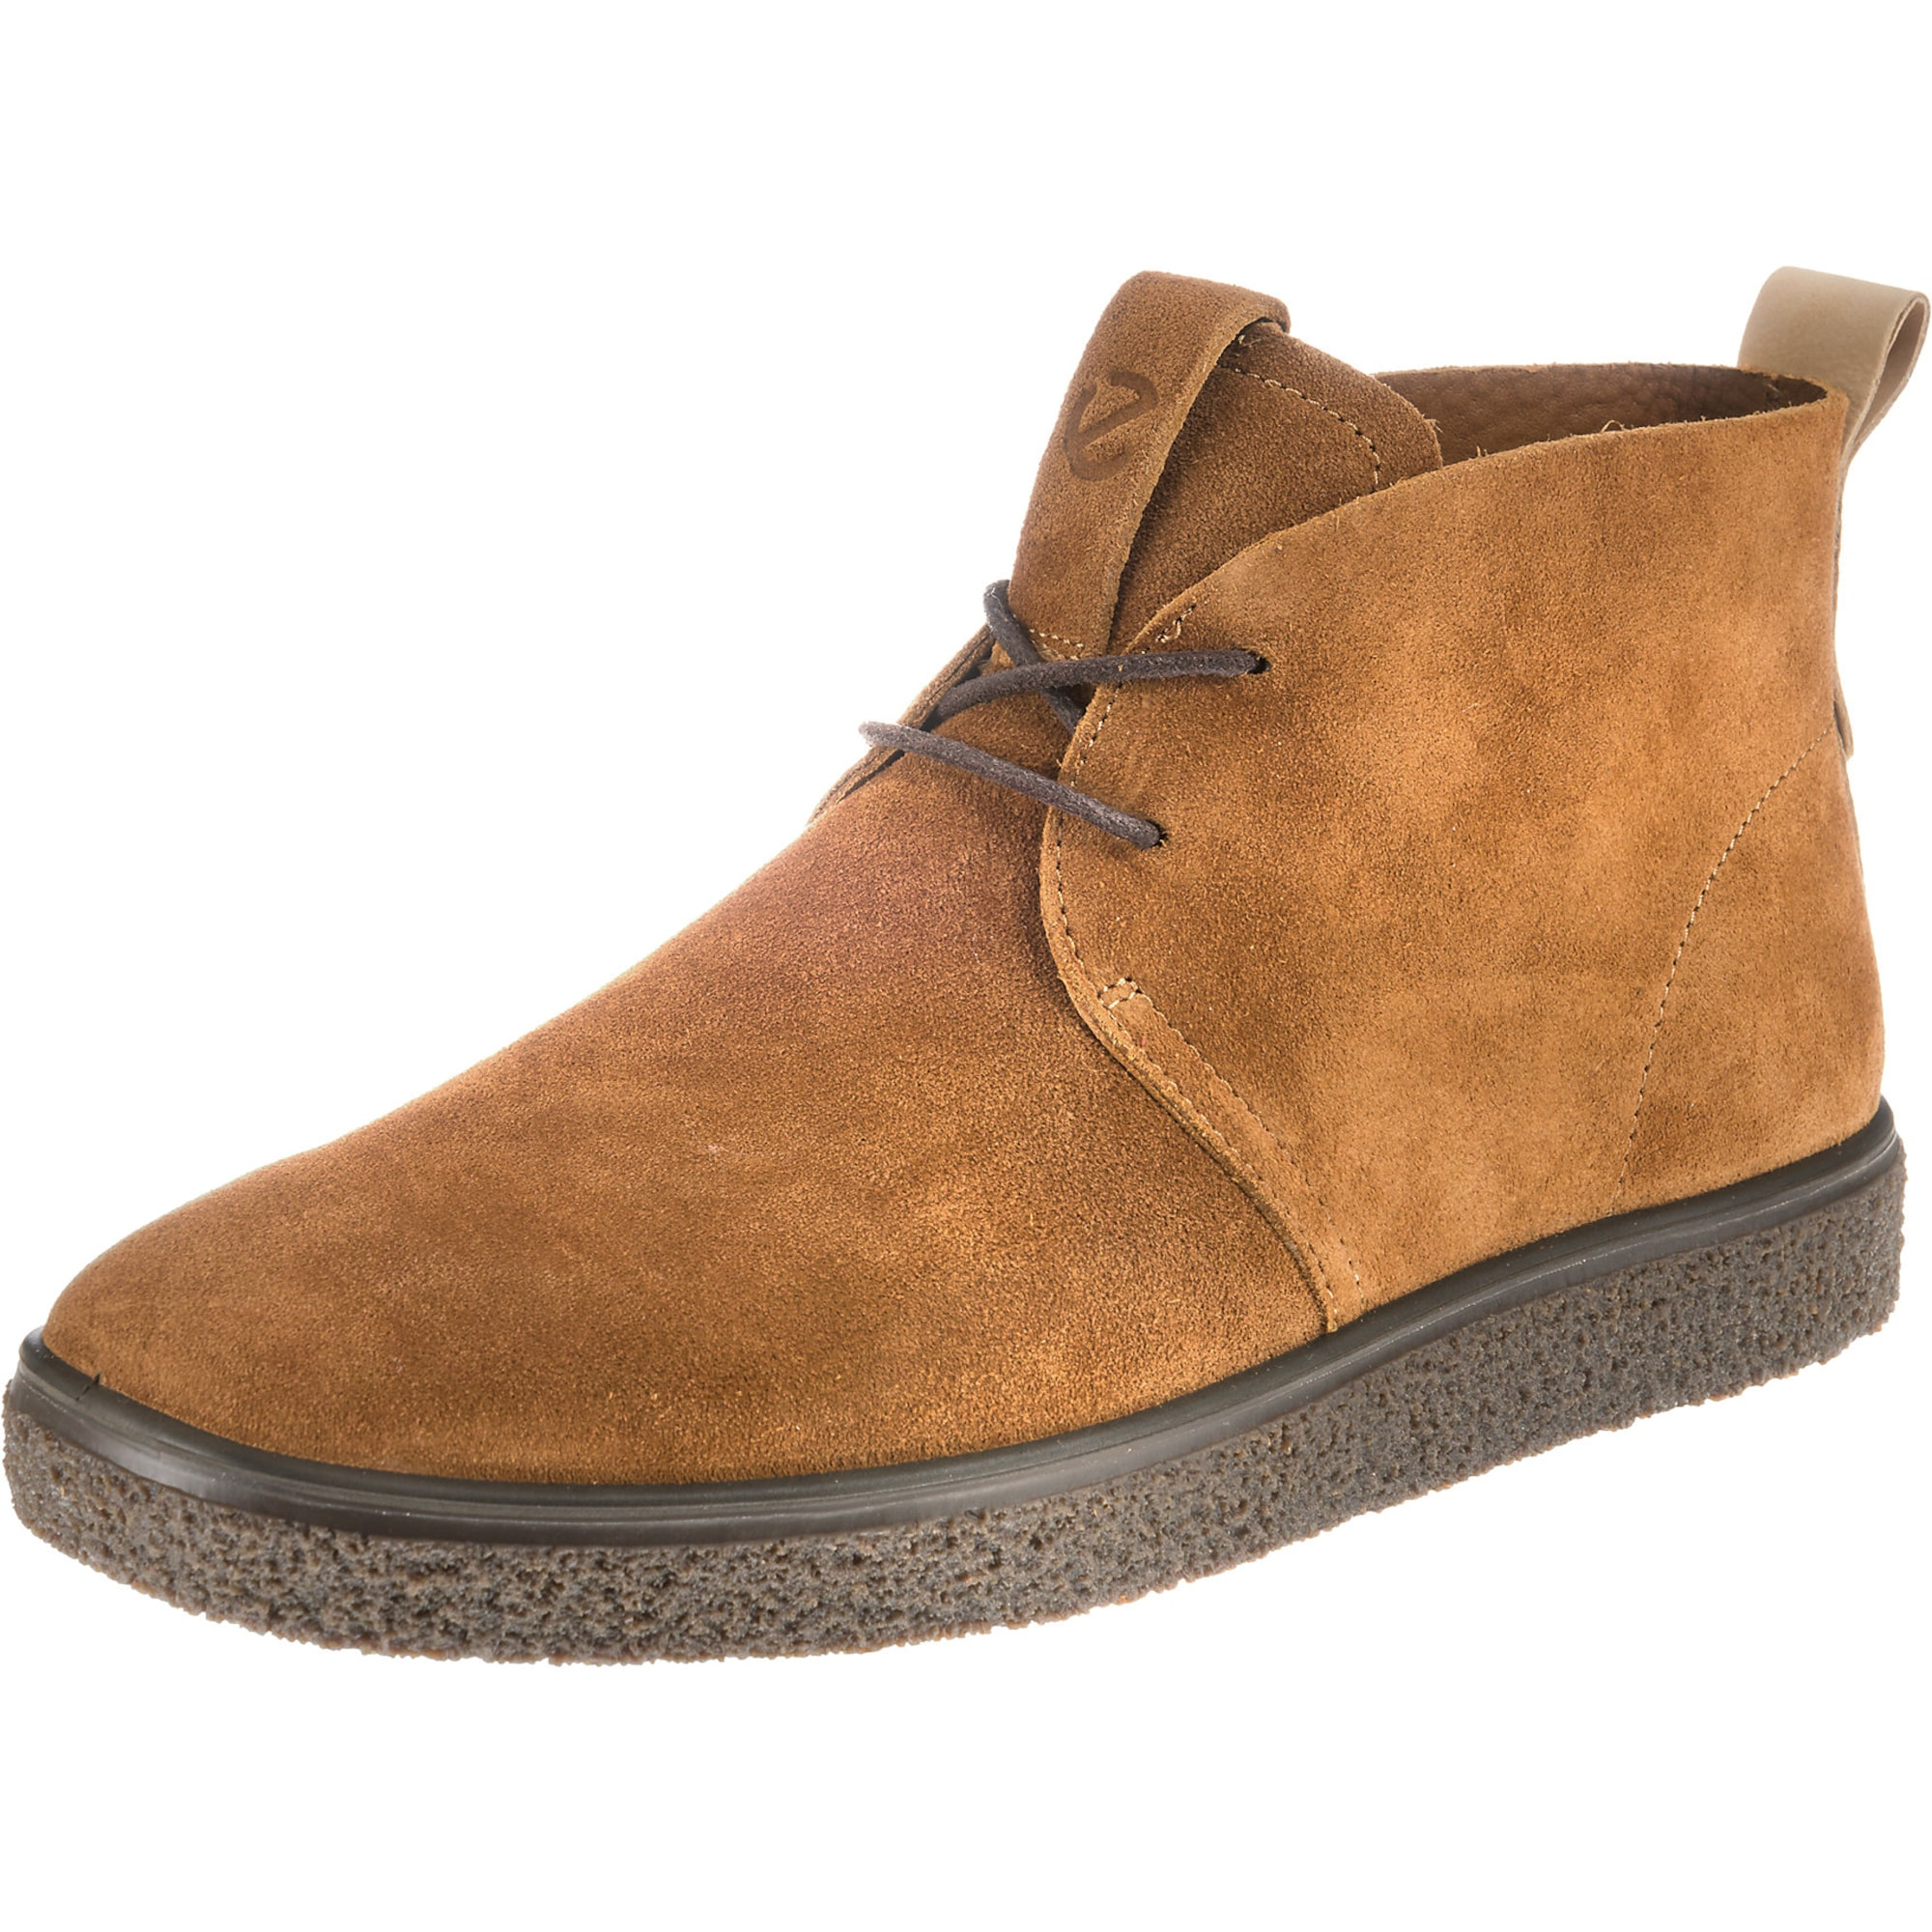 brand new fa6f4 51b1c AboutYou | Herren ECCO ECCO Crepetray Mens Desert Boots ...